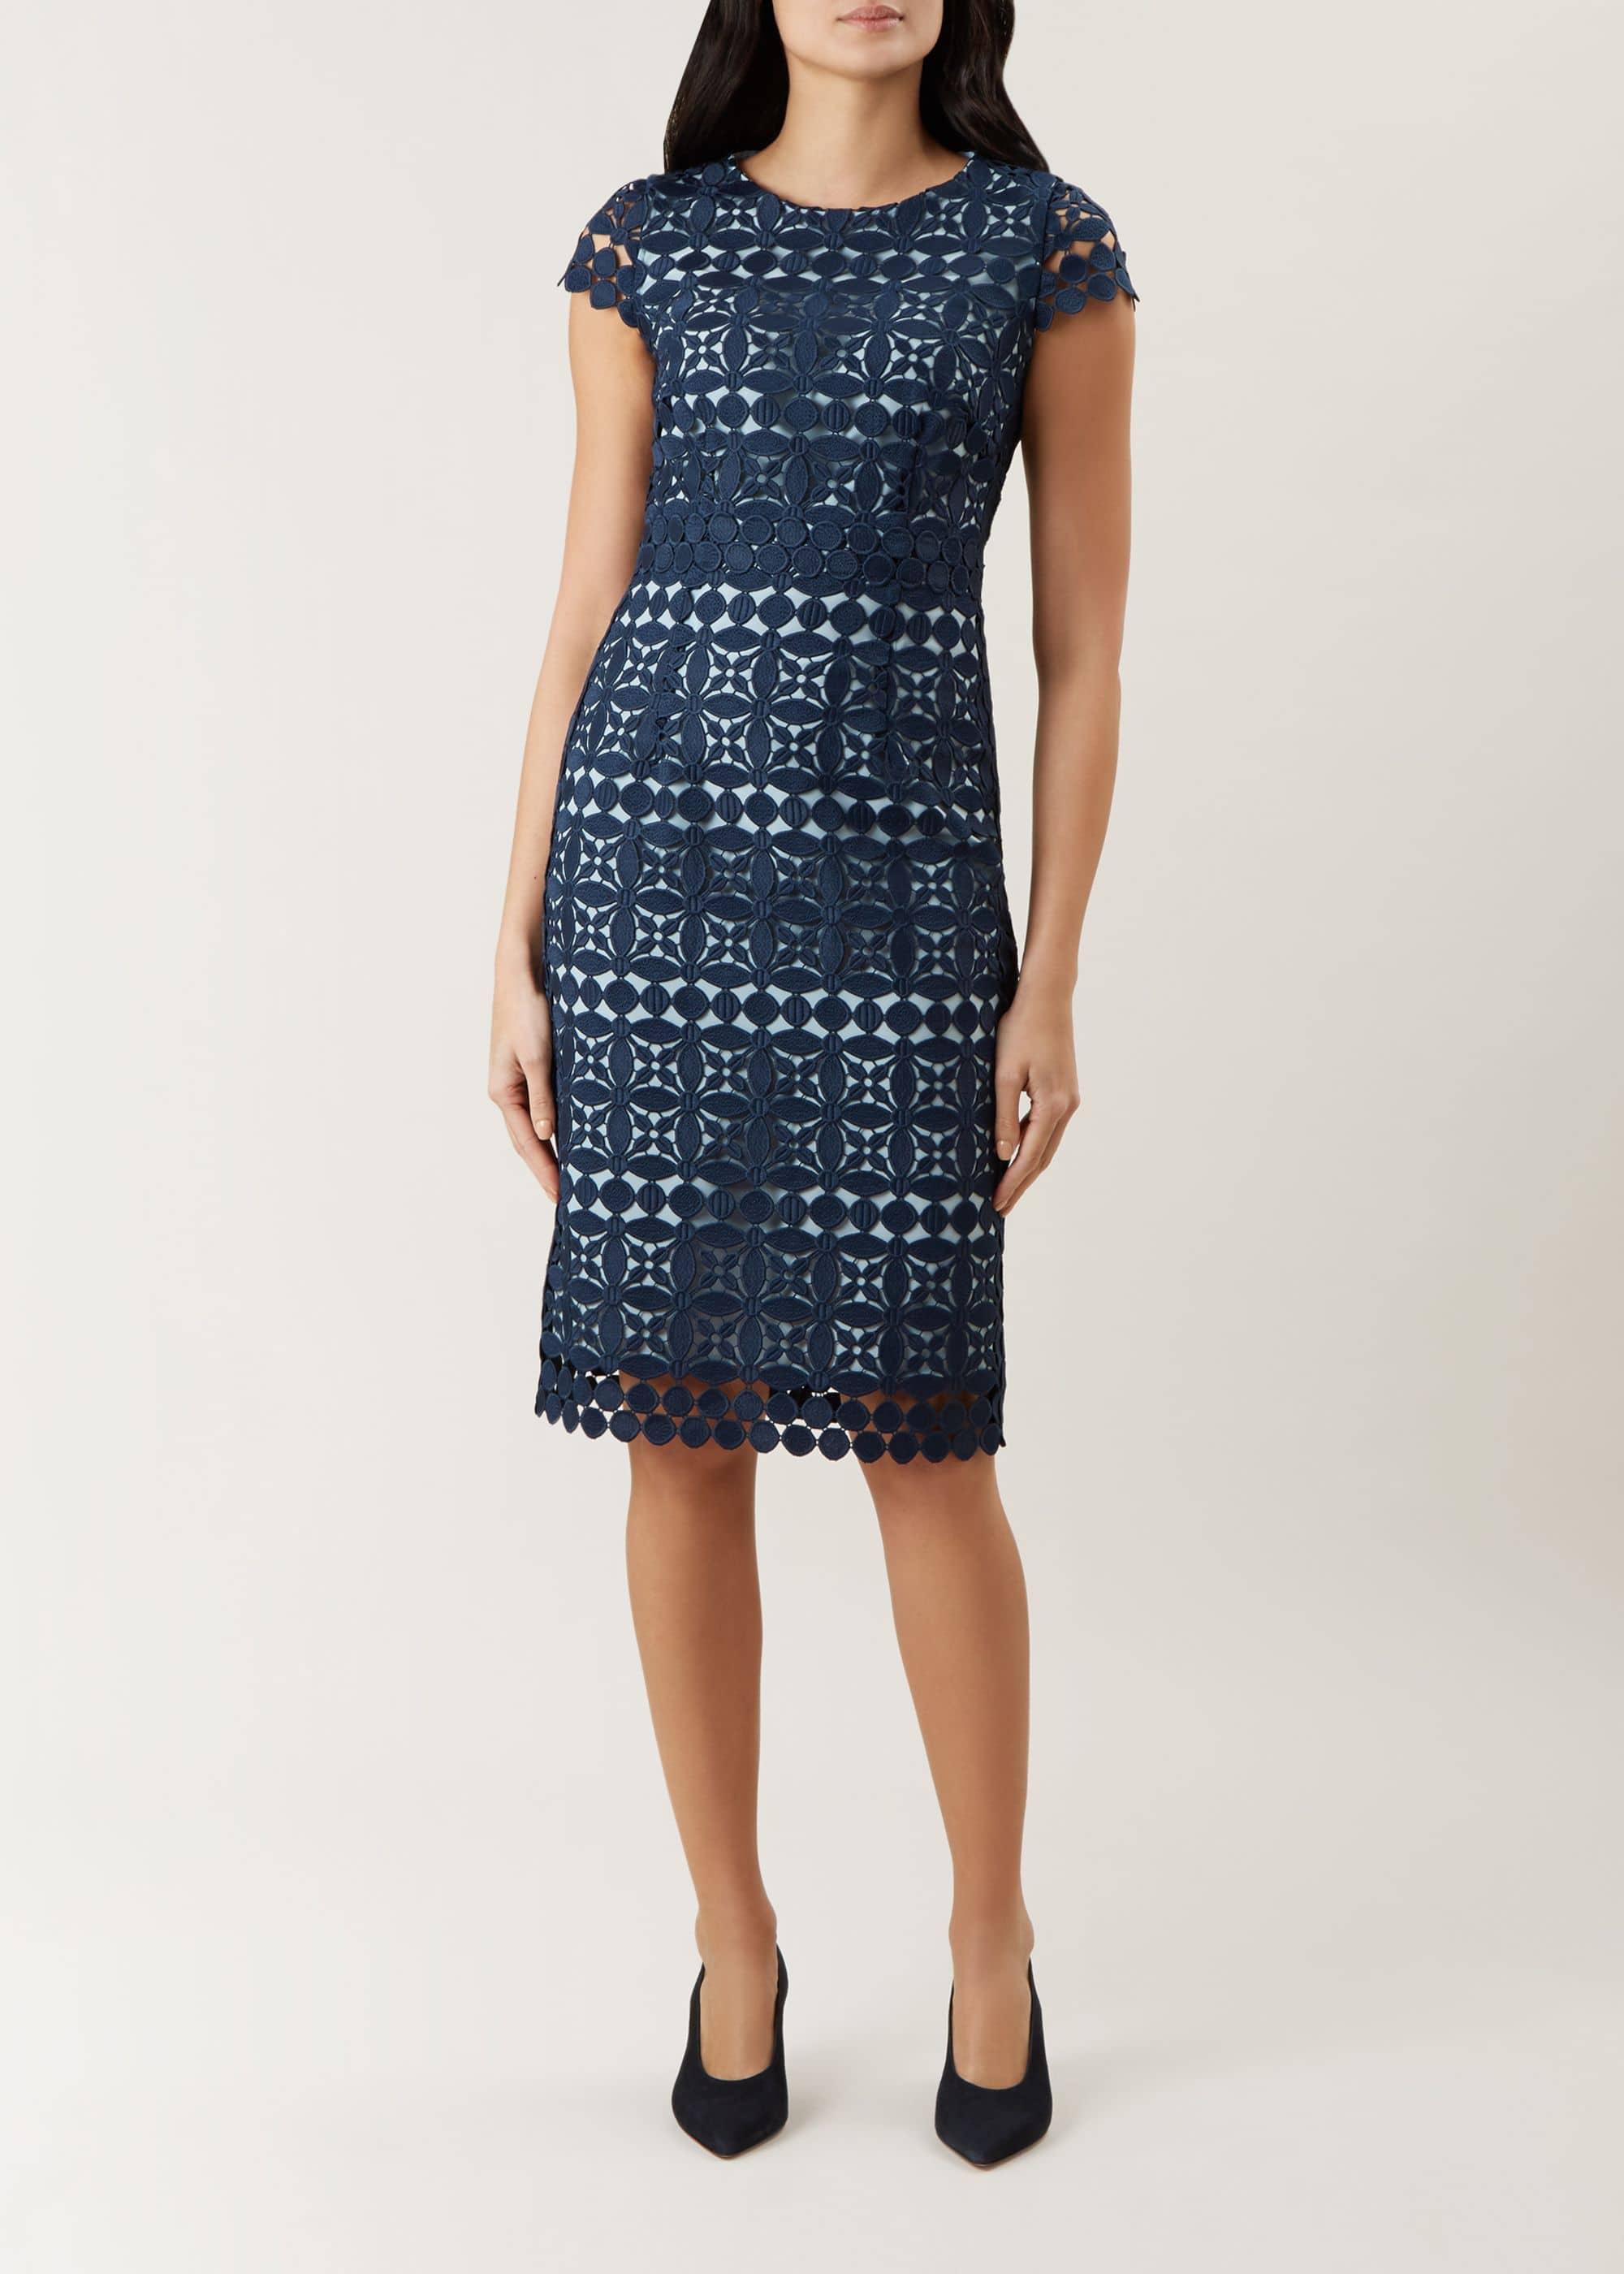 Hobbs Women Mabelle Lace Dress